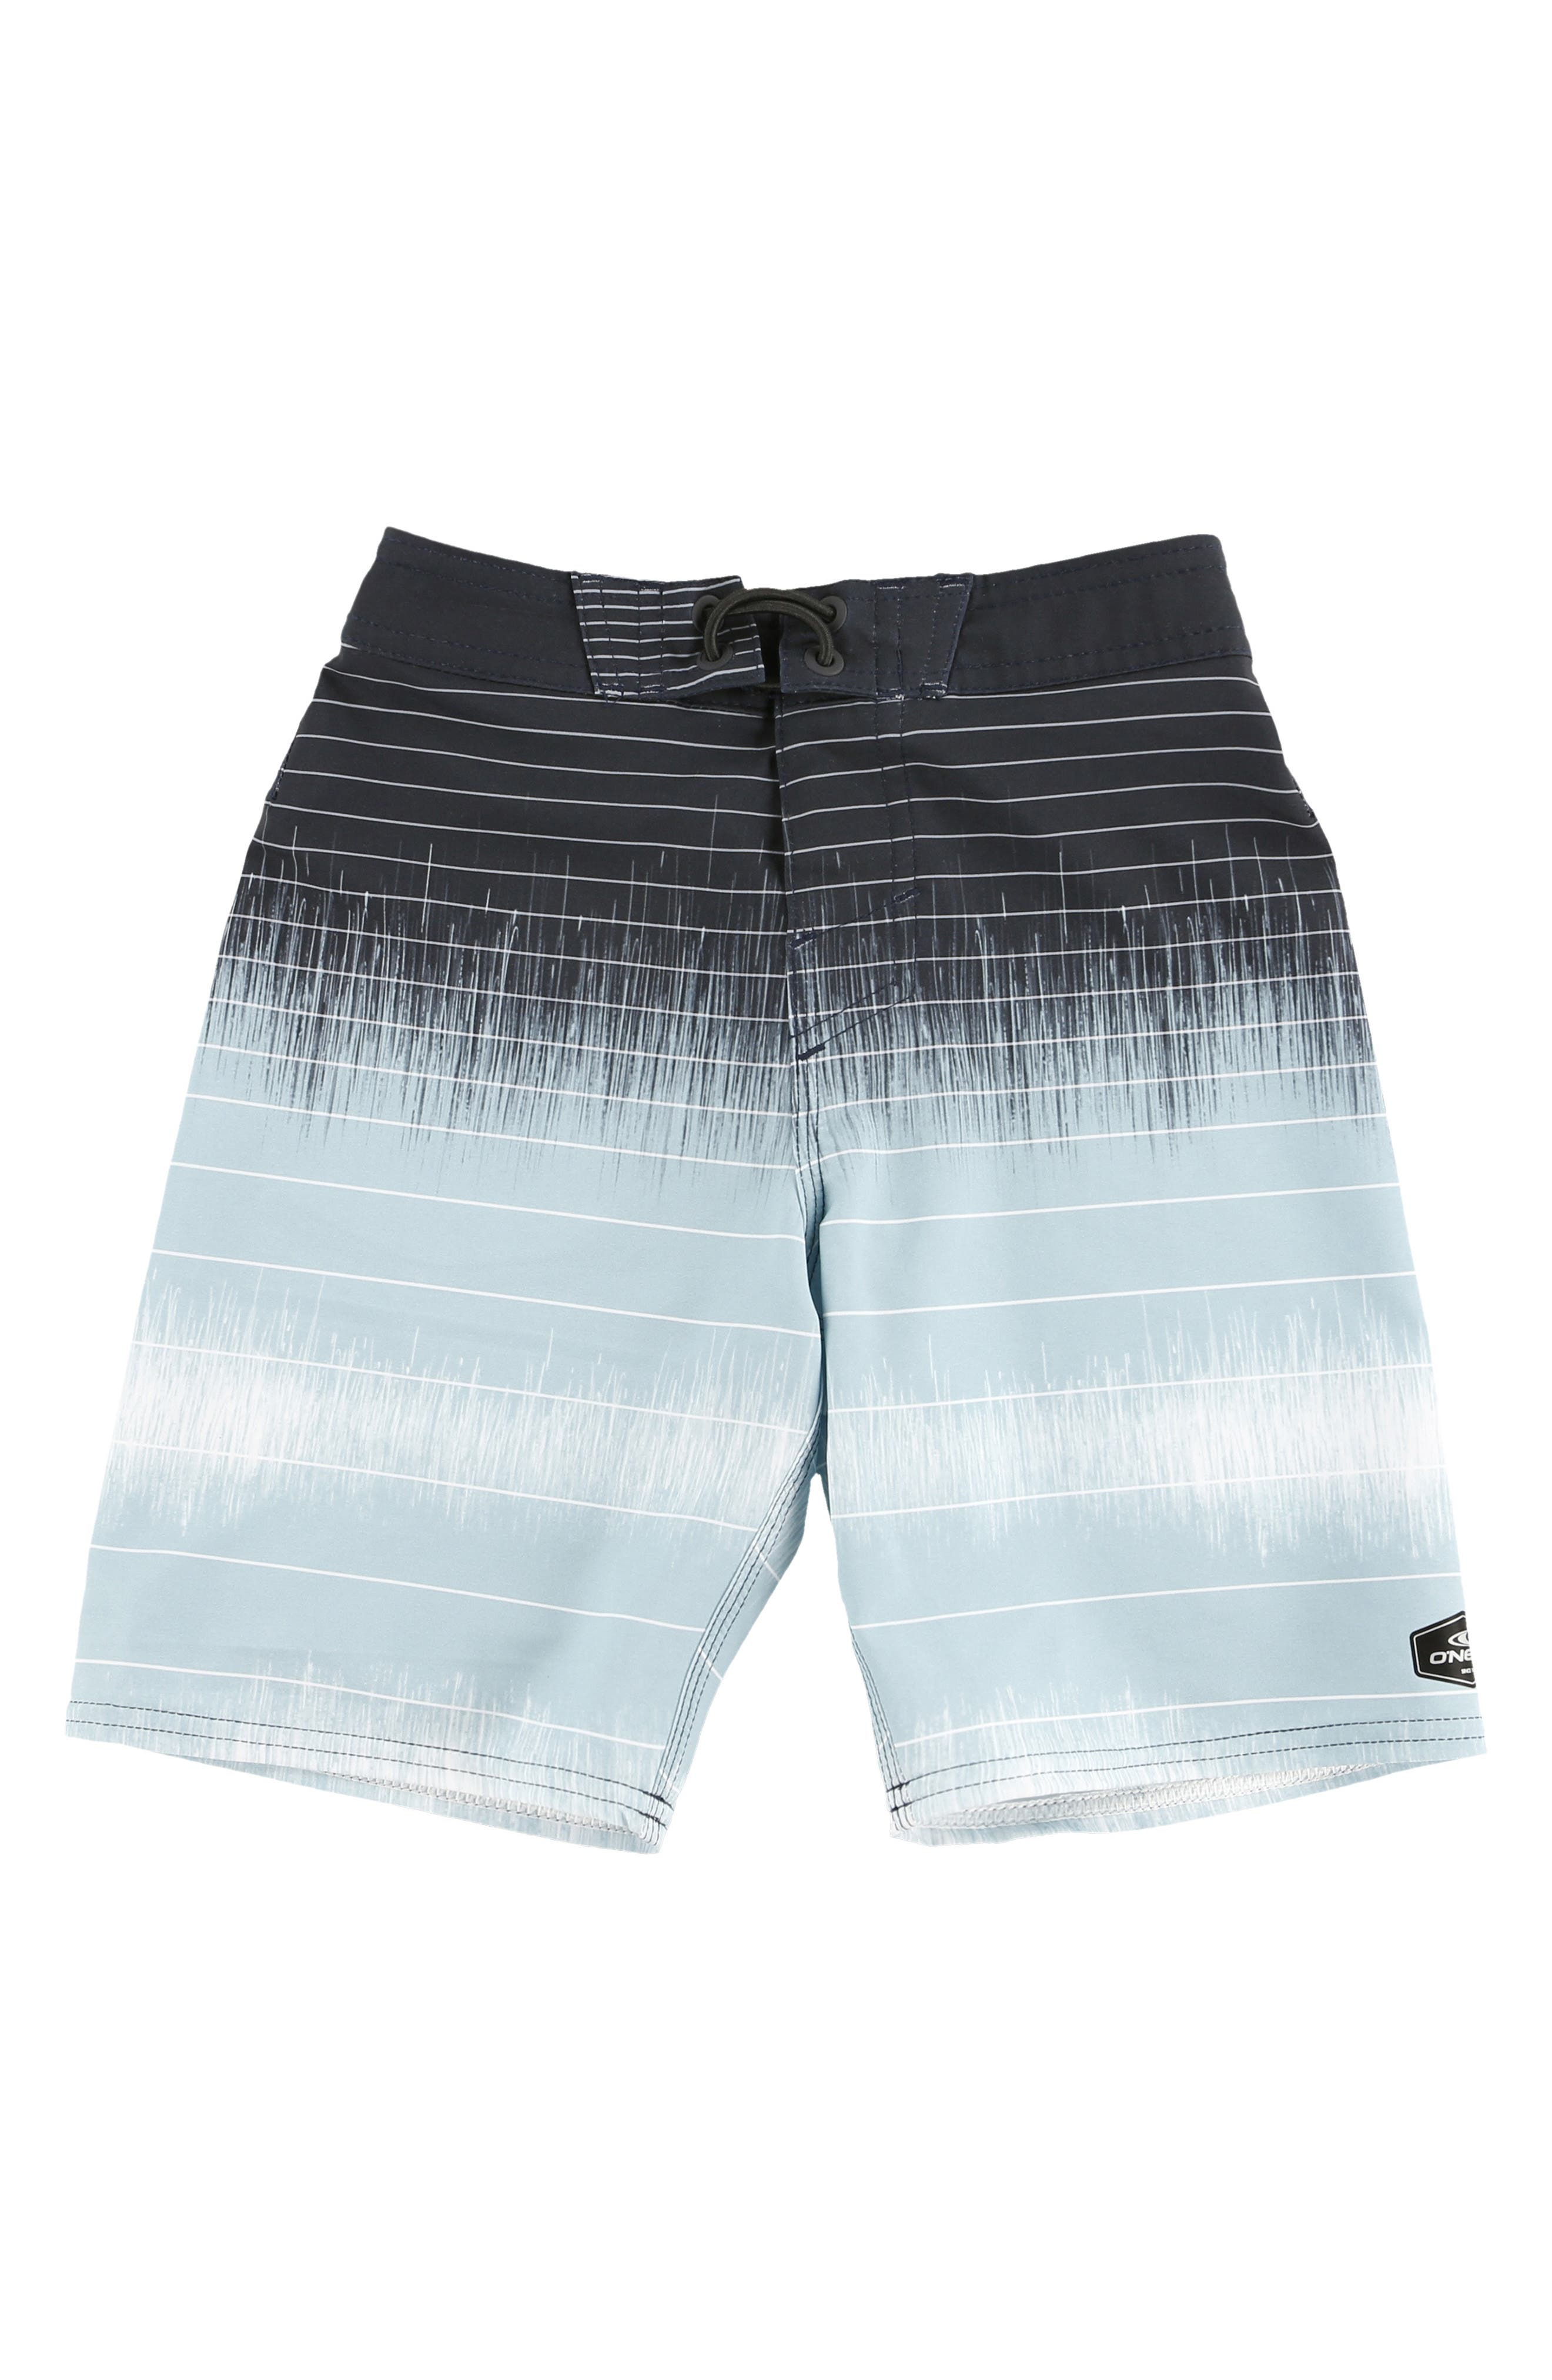 Hyperfreak Seismic Board Shorts,                             Main thumbnail 1, color,                             400